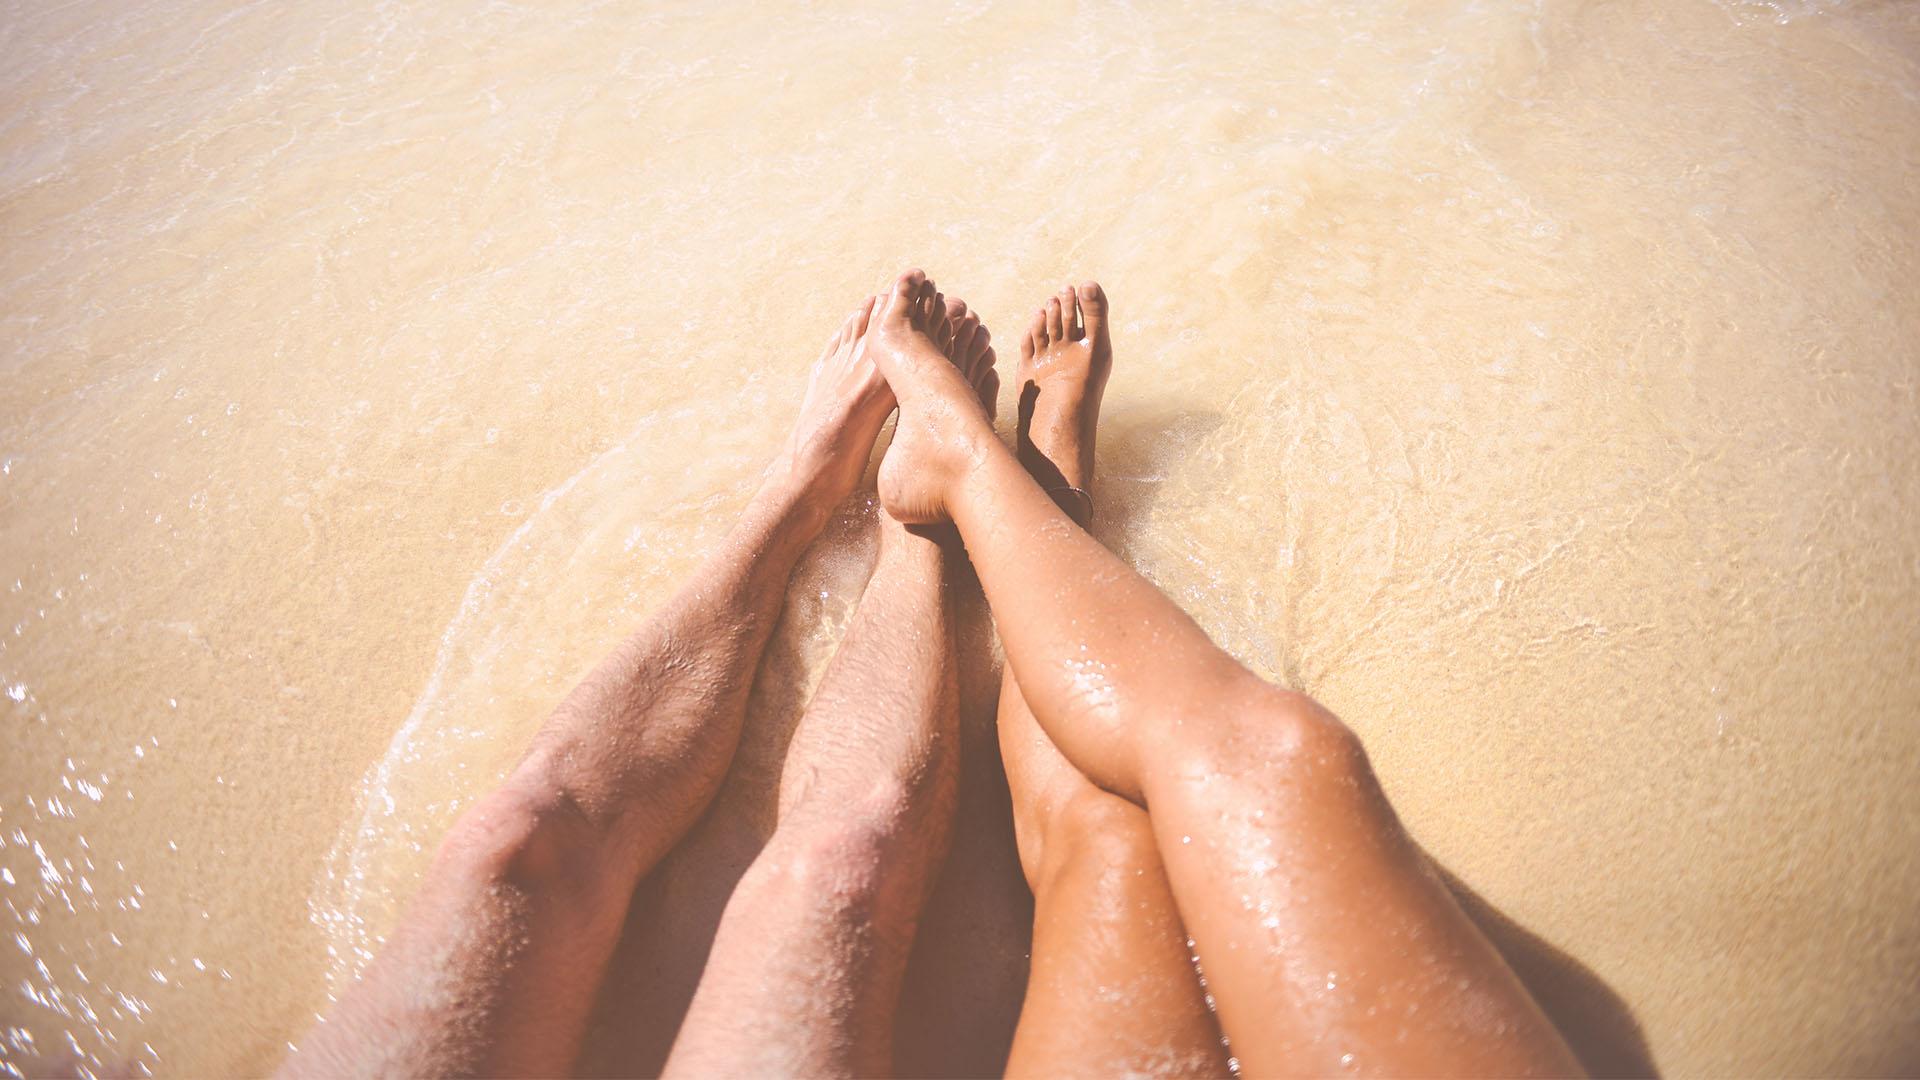 crane_0004_sea-beach-vacation-couple